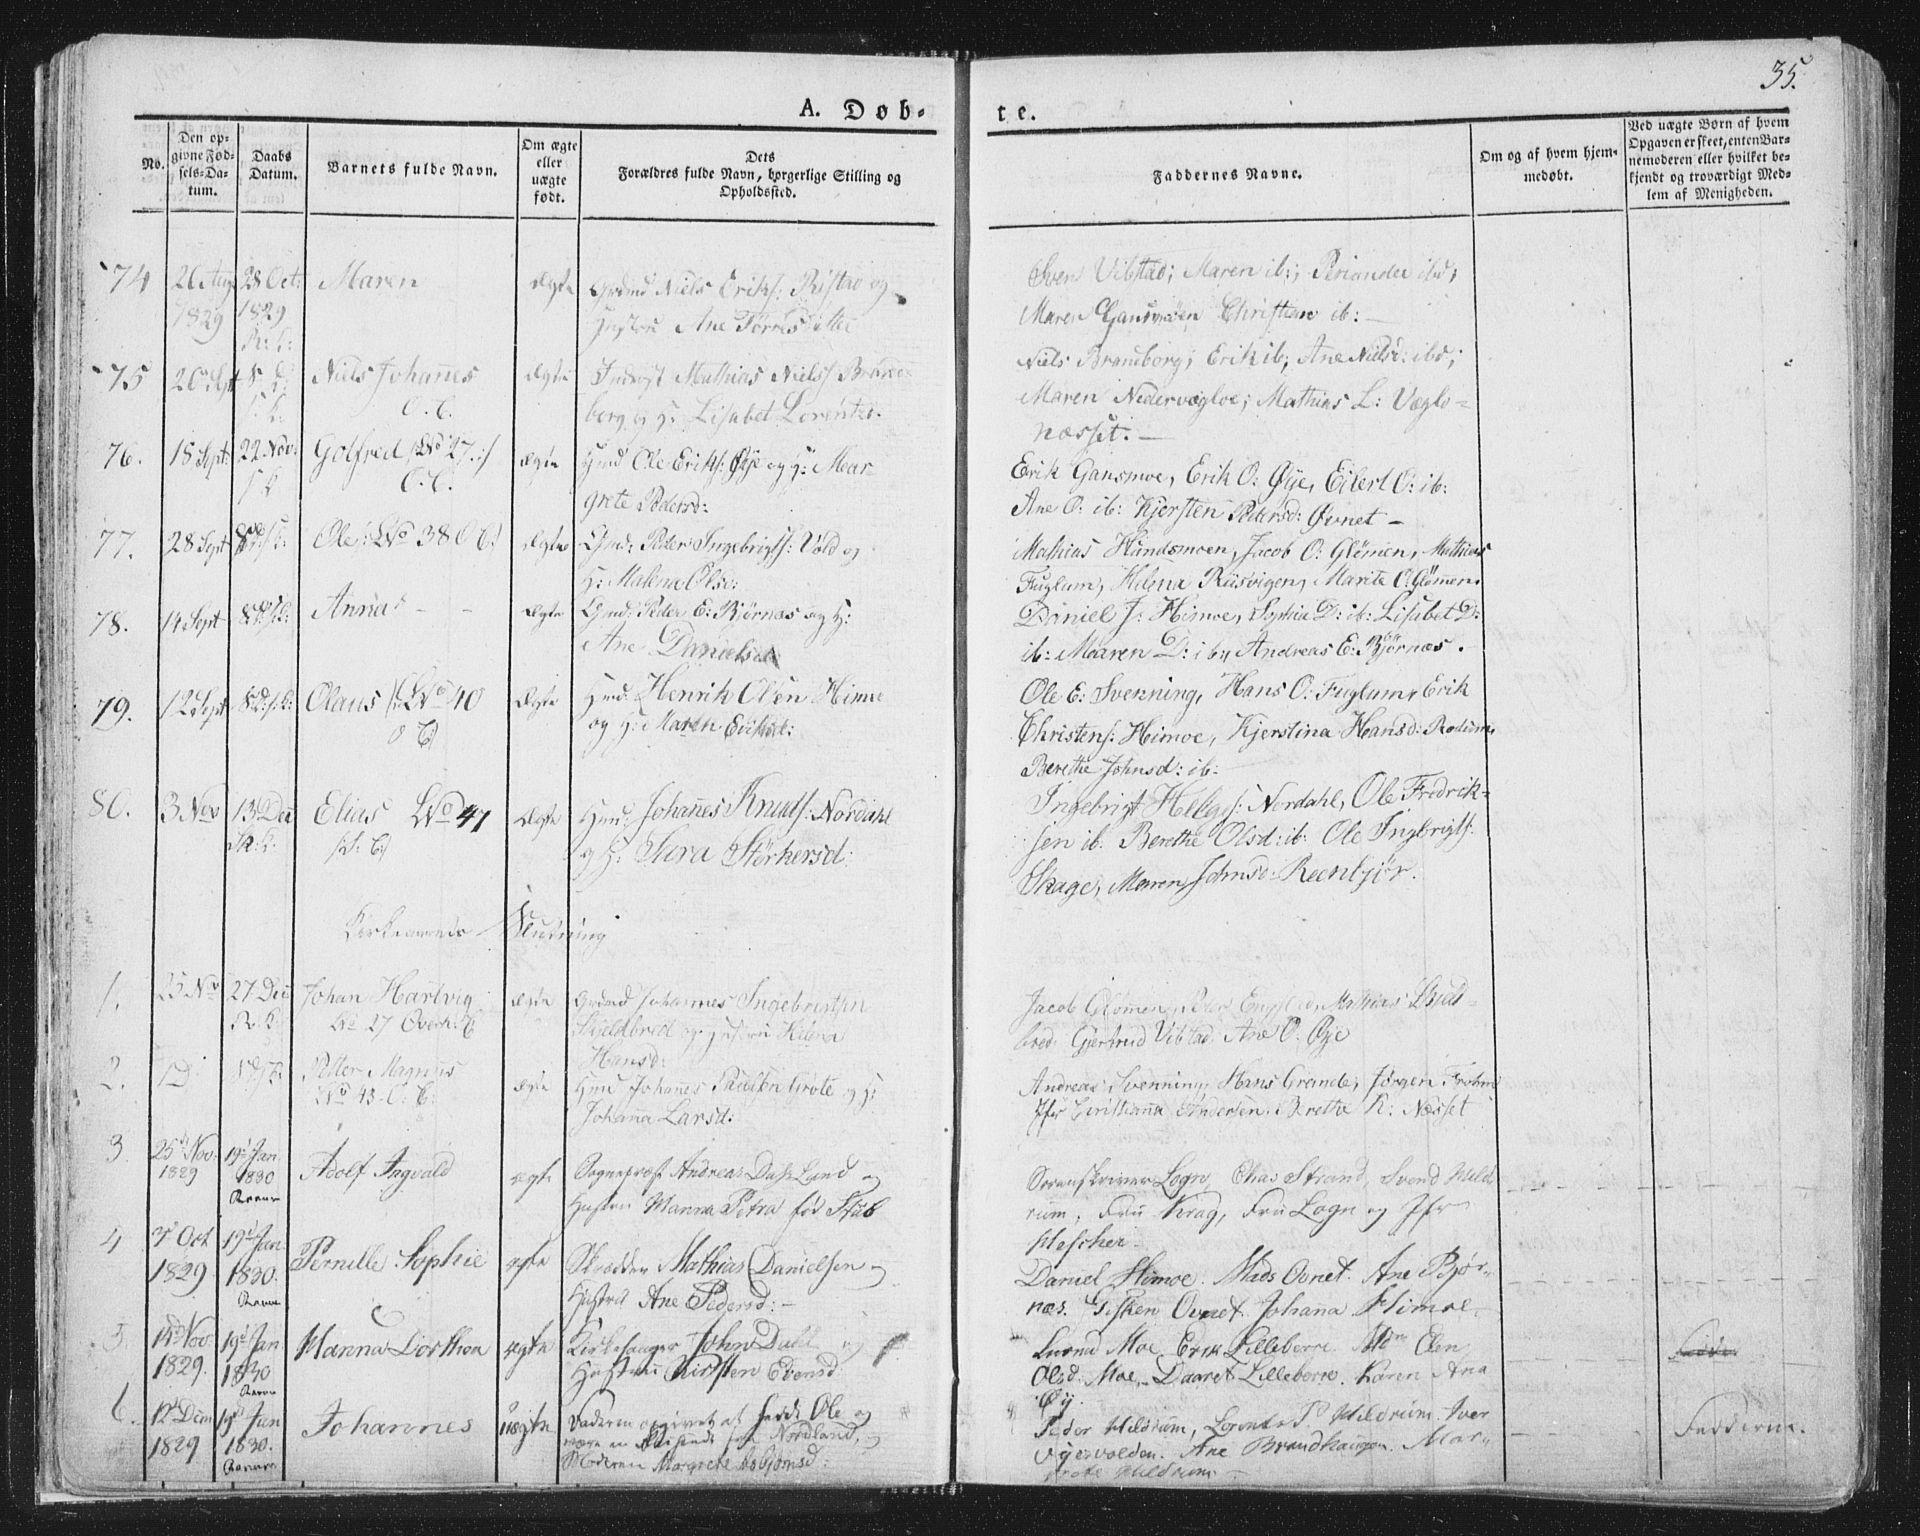 SAT, Ministerialprotokoller, klokkerbøker og fødselsregistre - Nord-Trøndelag, 764/L0551: Ministerialbok nr. 764A07a, 1824-1864, s. 35